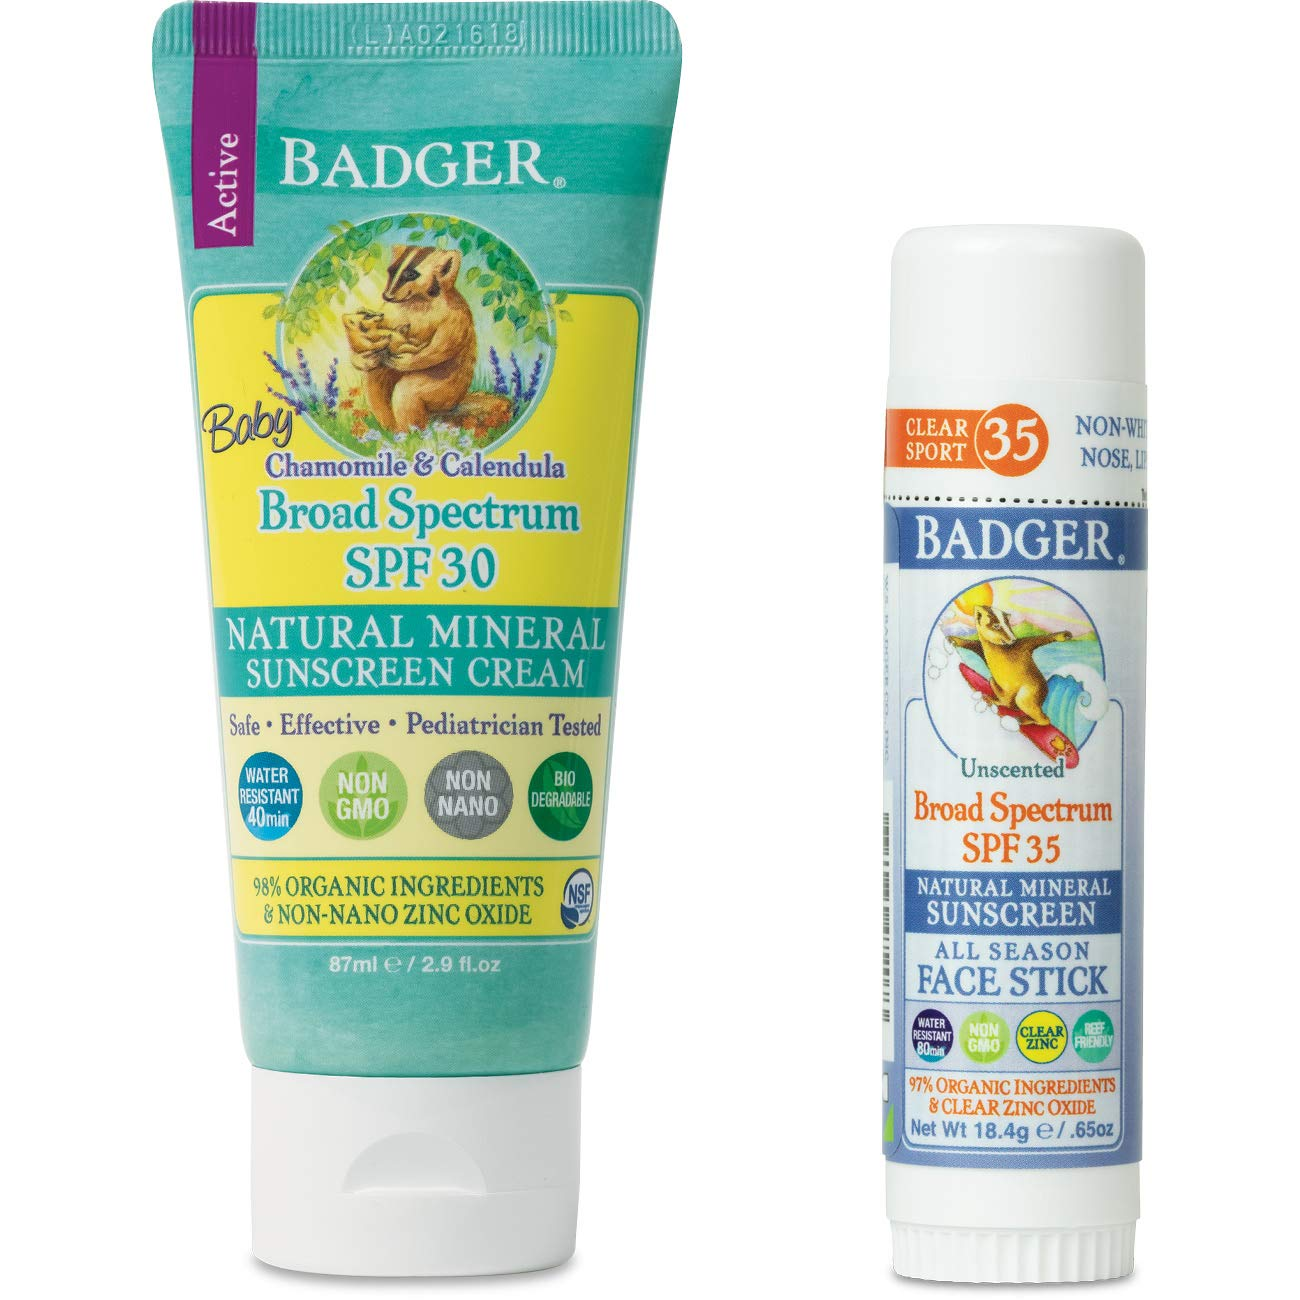 Badger - Baby SPF 30 Sunscreen Cream & Unscented SPF 35 Sport Sunscreen Face Stick, Broad Spectrum Water Resistant Reef Safe Sunscreen, Natural Mineral Sunscreen, 2.9 fl oz Cream, 0.65 oz Stick